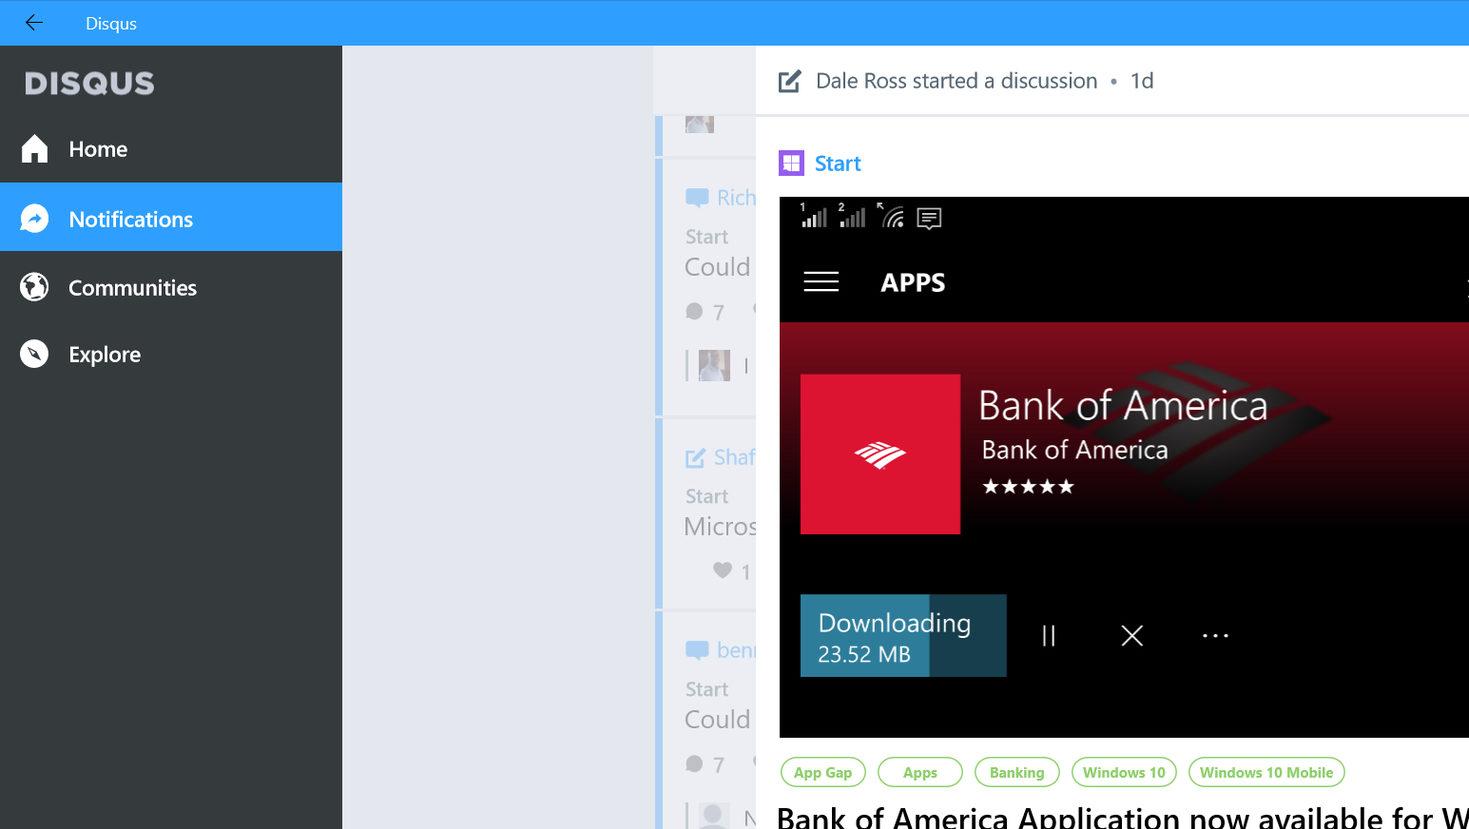 Dette er Disqus sin Windows 10-app.